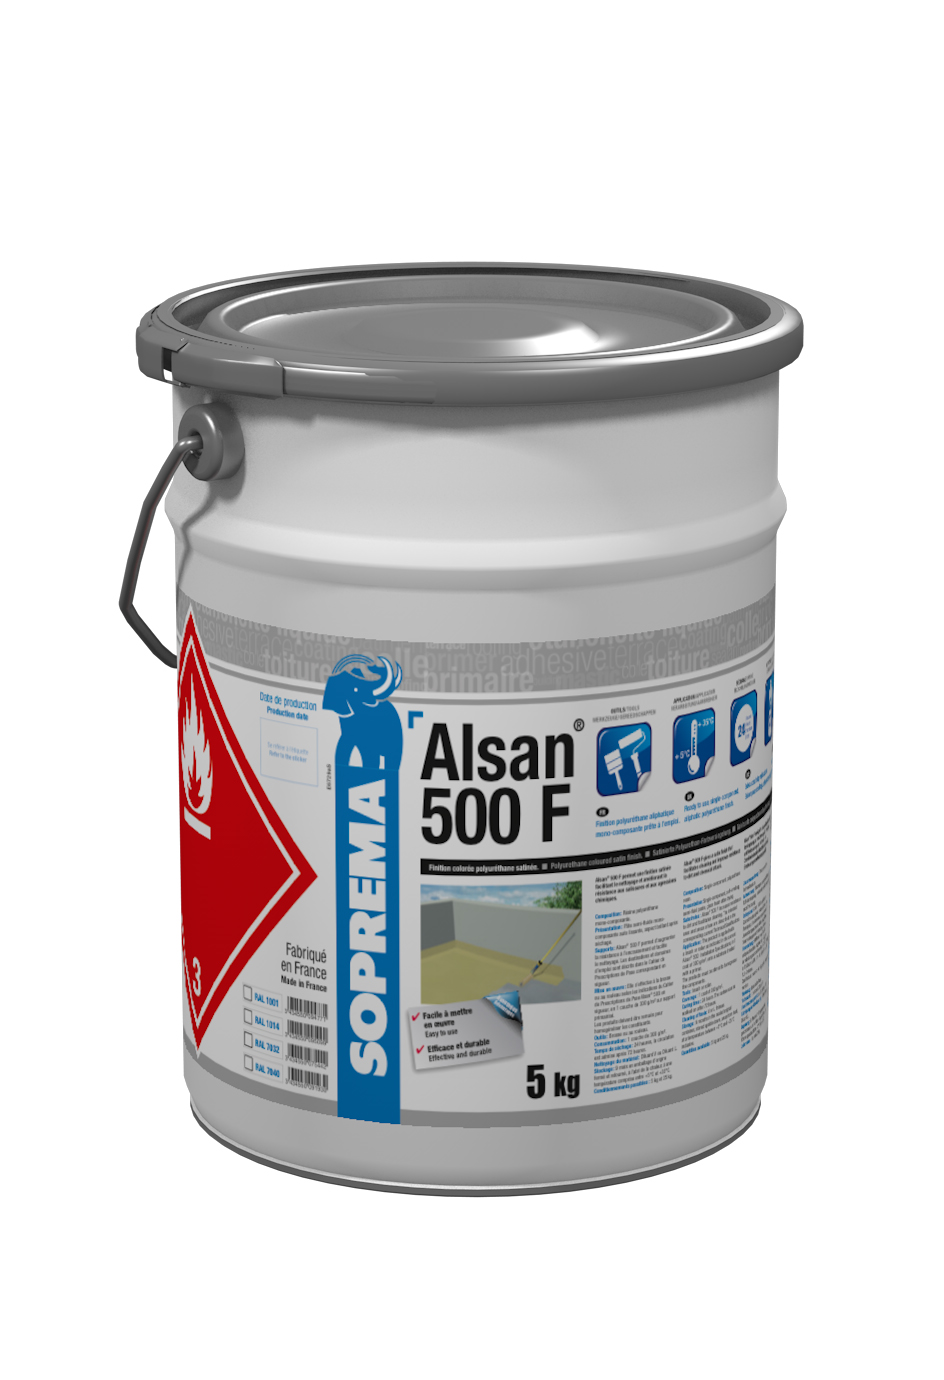 ALSAN 500 F